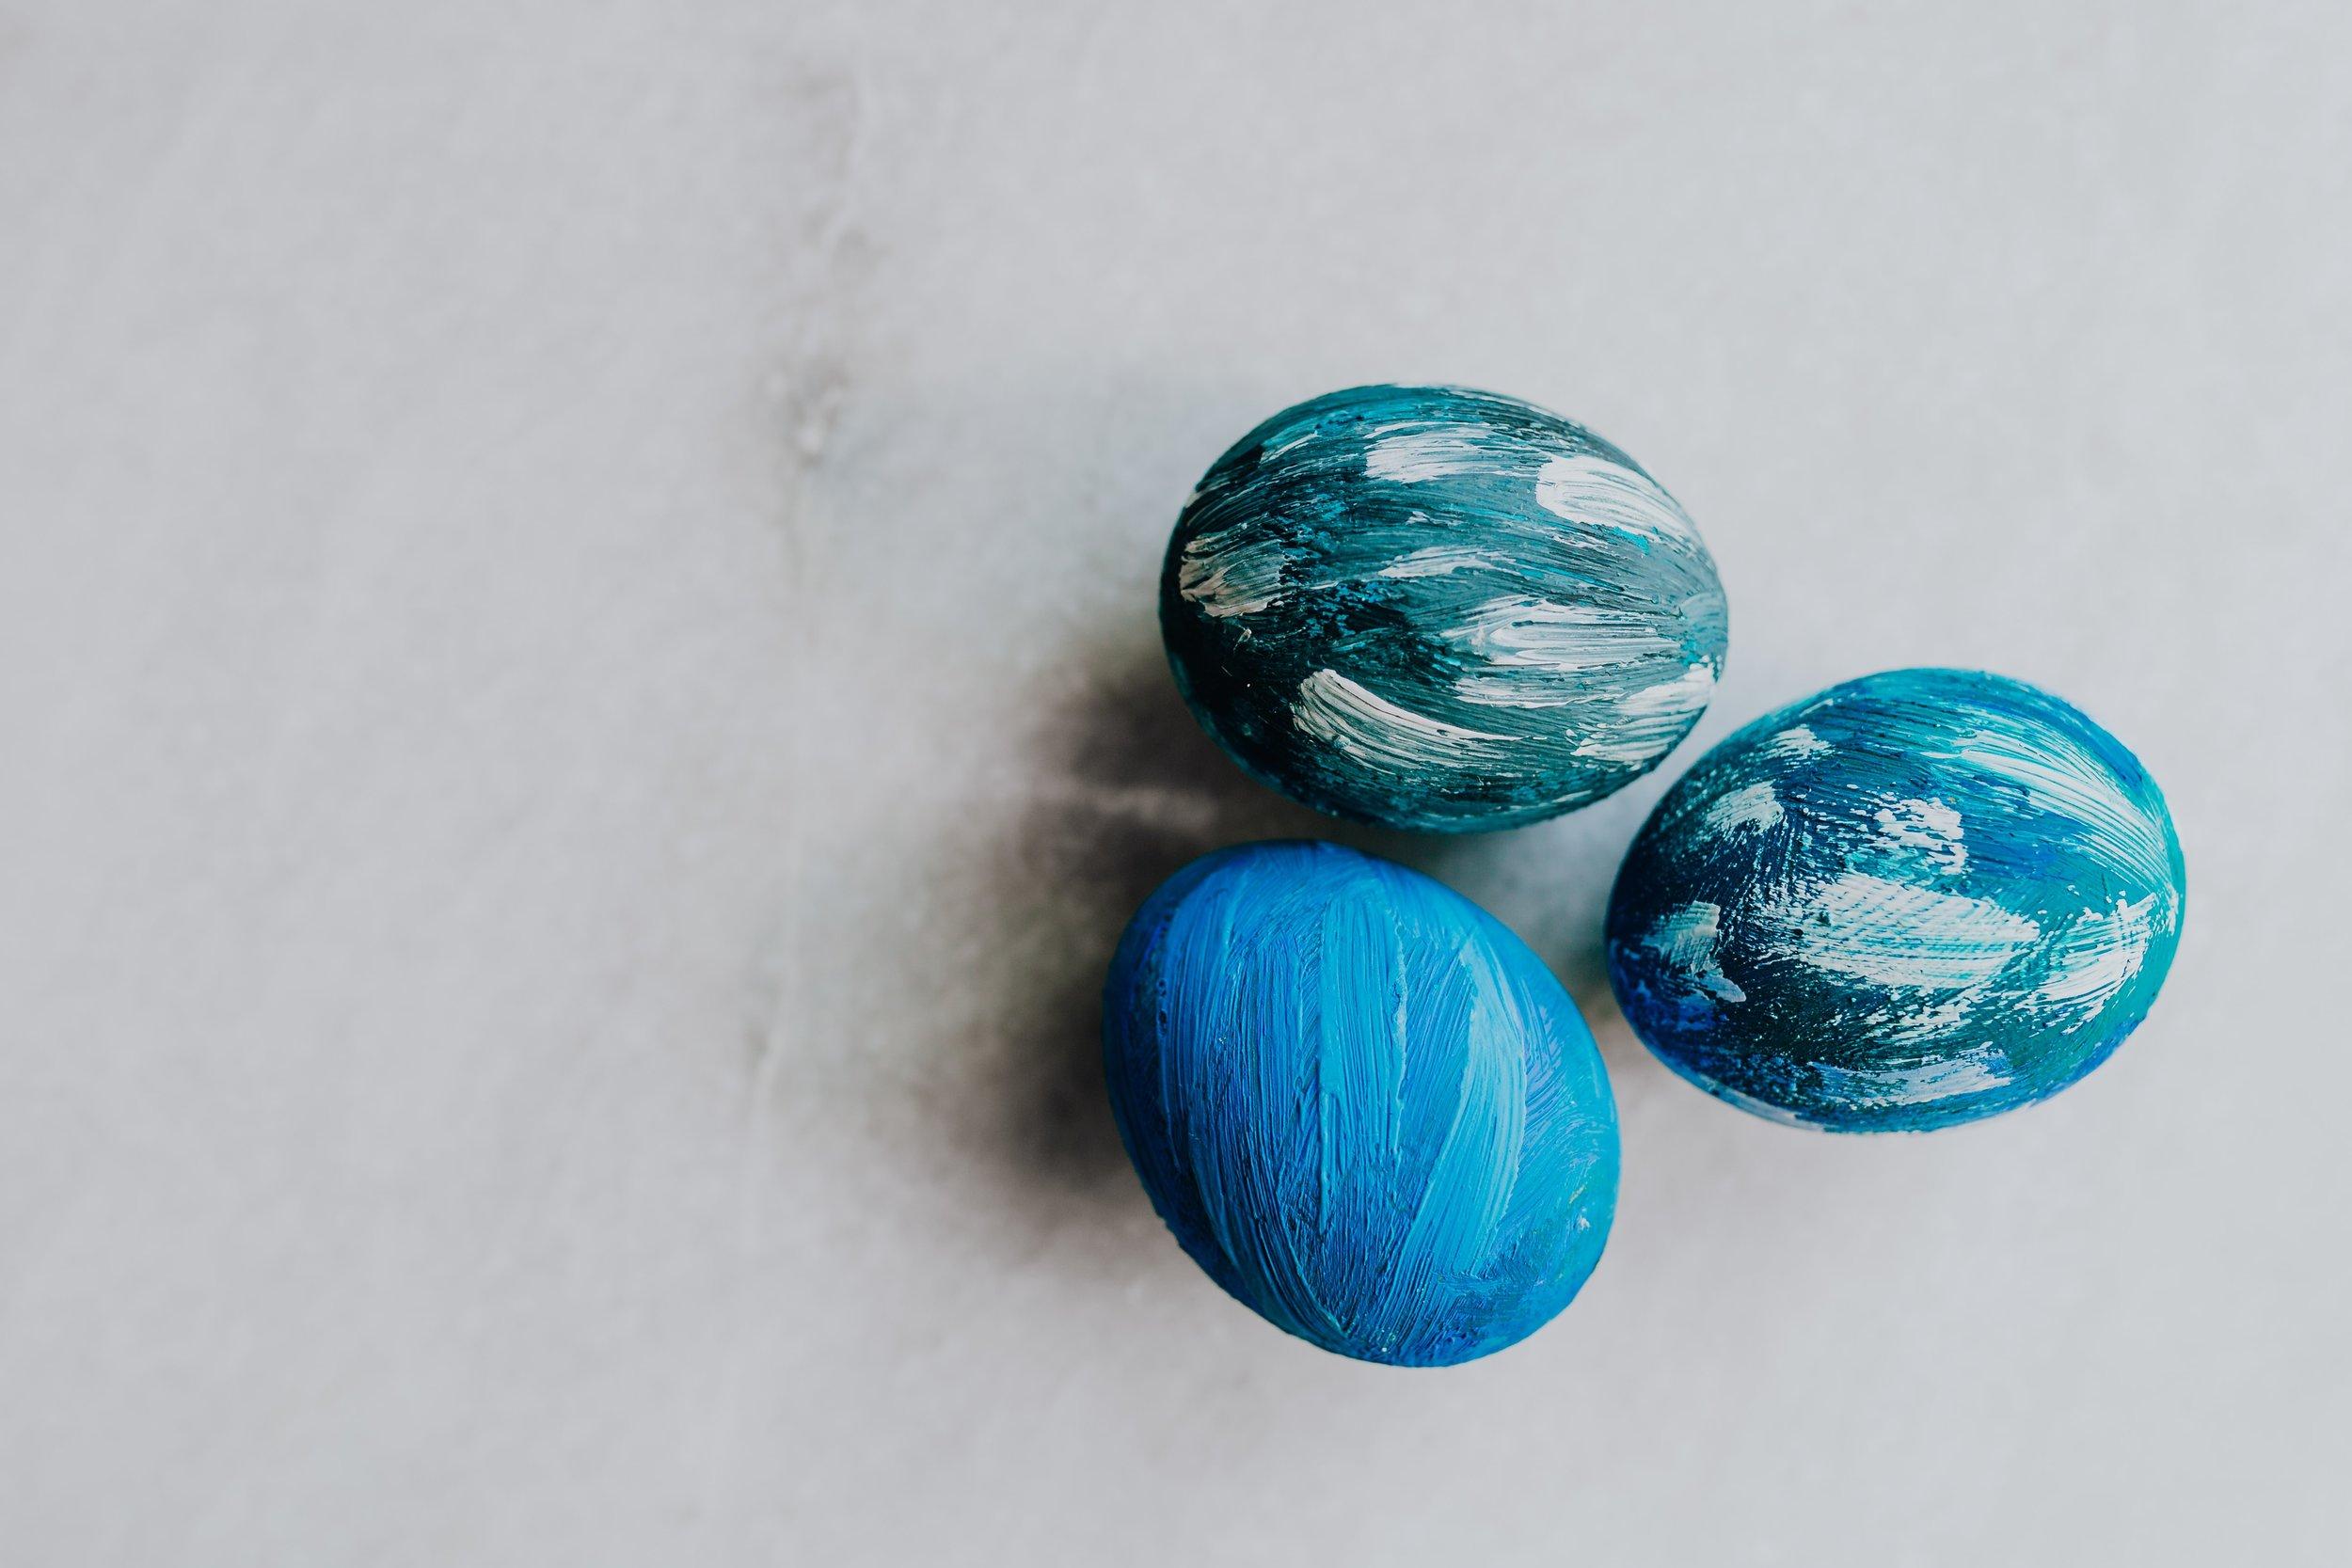 kaboompics_Blue Easter Eggs-2.jpg